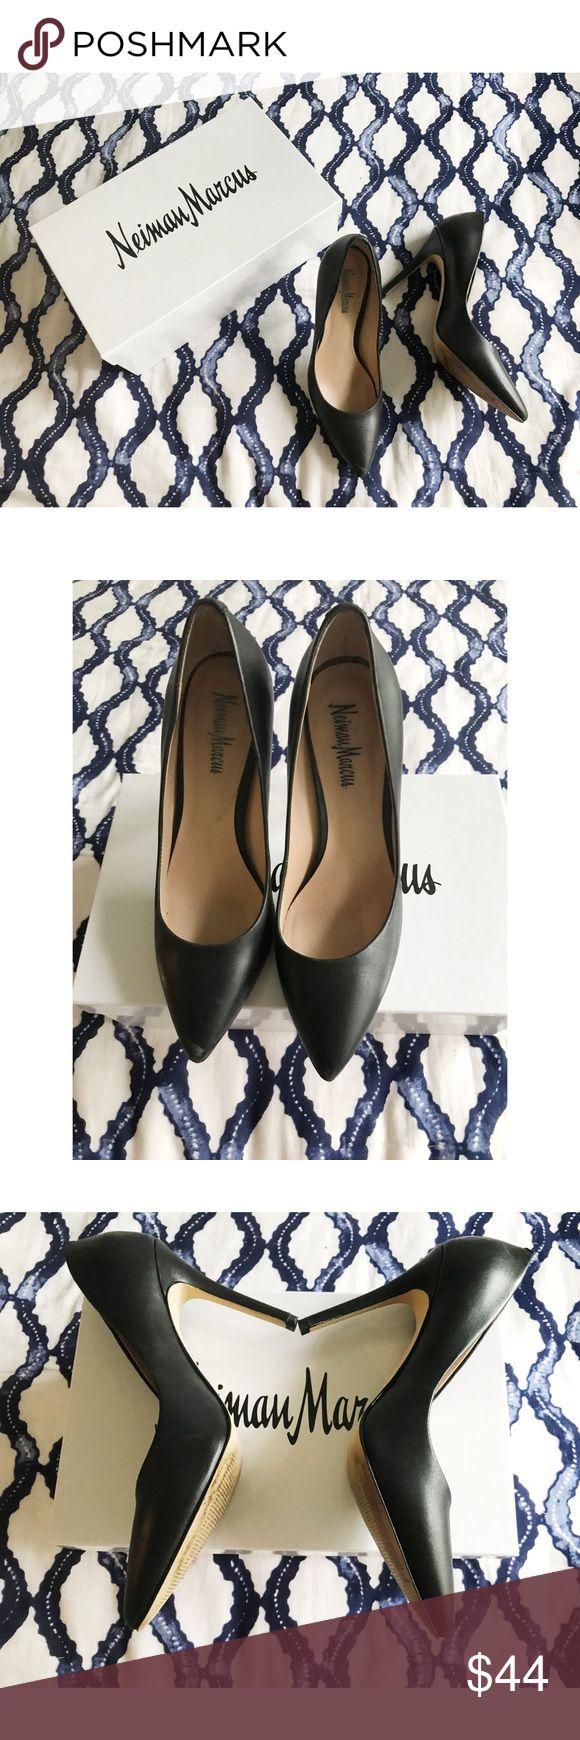 Neiman Marcus Stilettos Worn twice! Mint condition! Neiman Marcus Shoes Heels